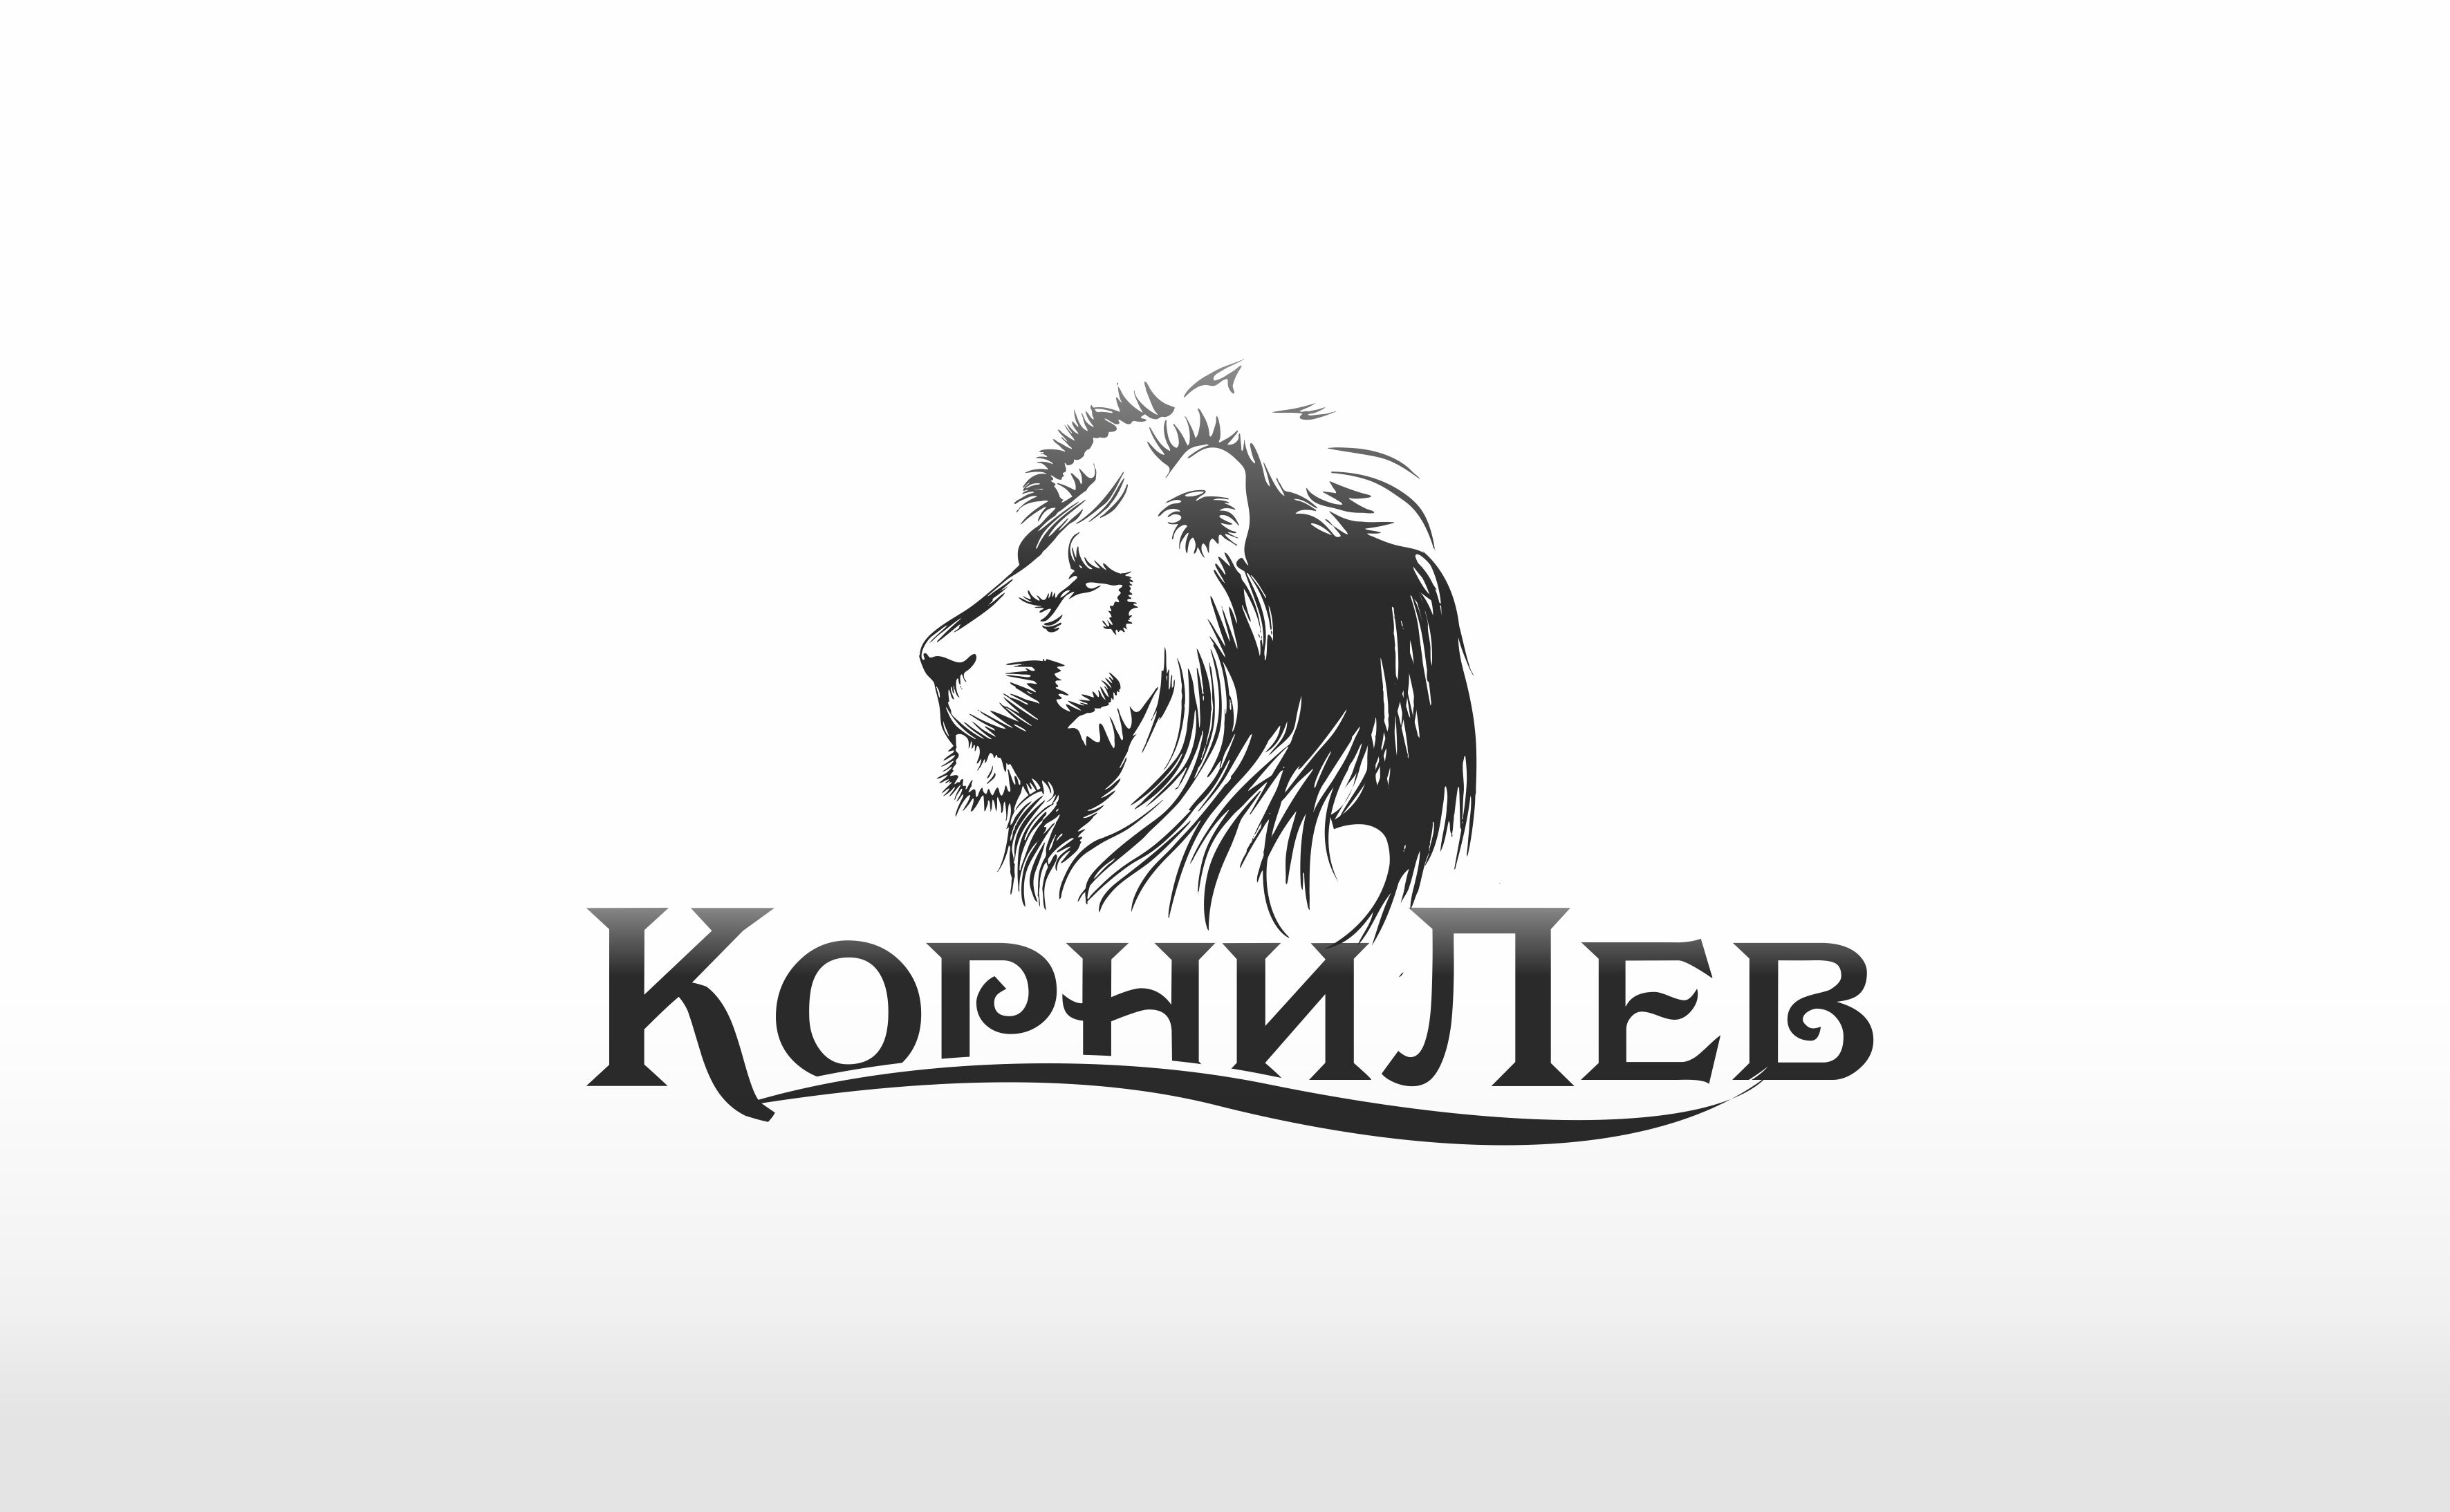 Логотип для компании КорниЛев - дизайнер IgorTsar